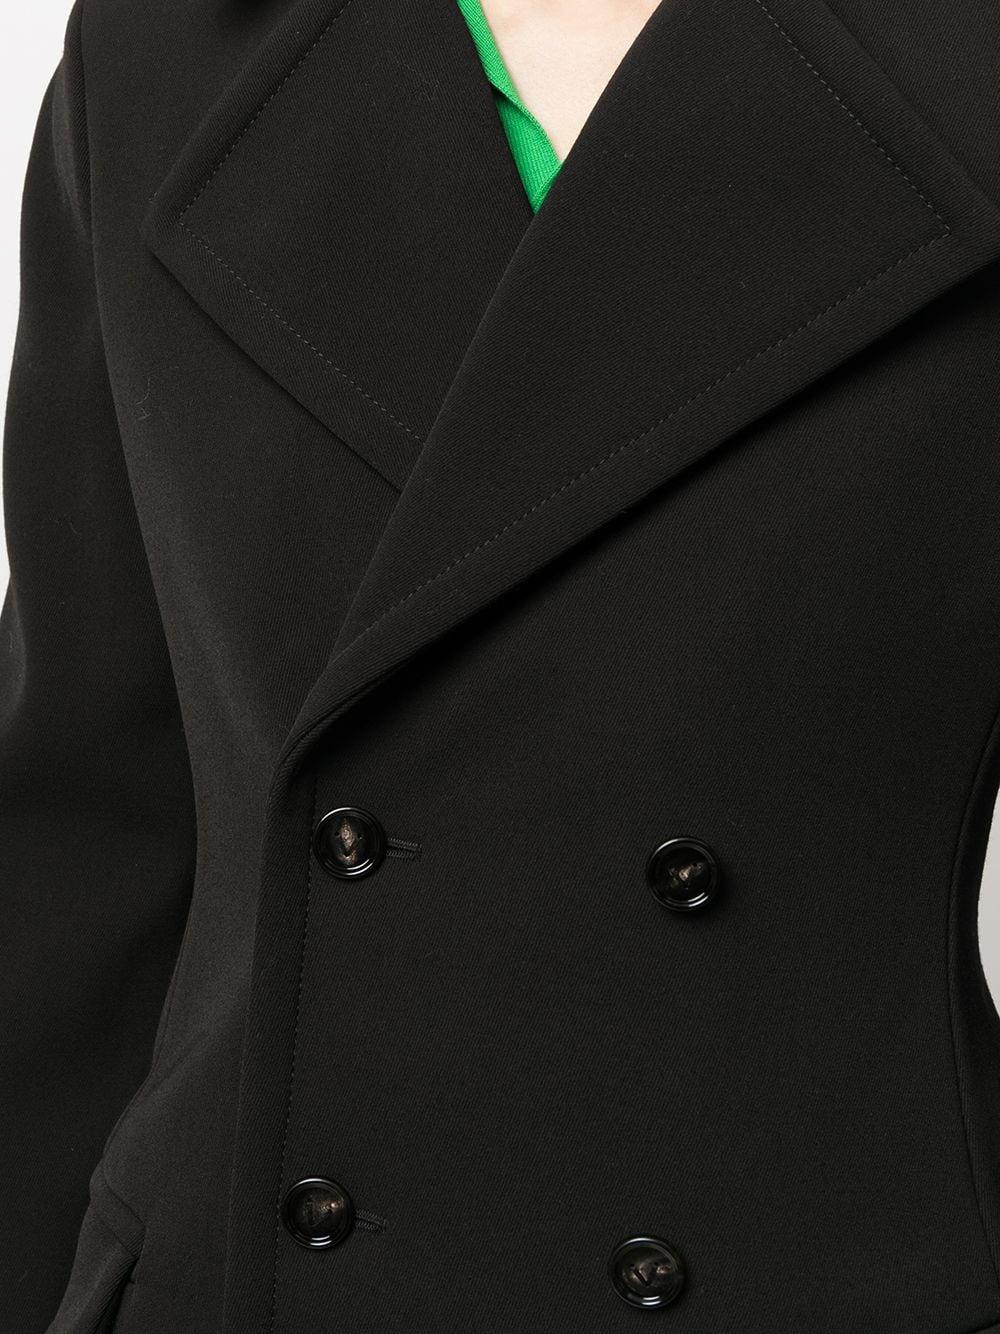 Picture of Bottega Veneta | Wool-Blend Double-Breasted Coat